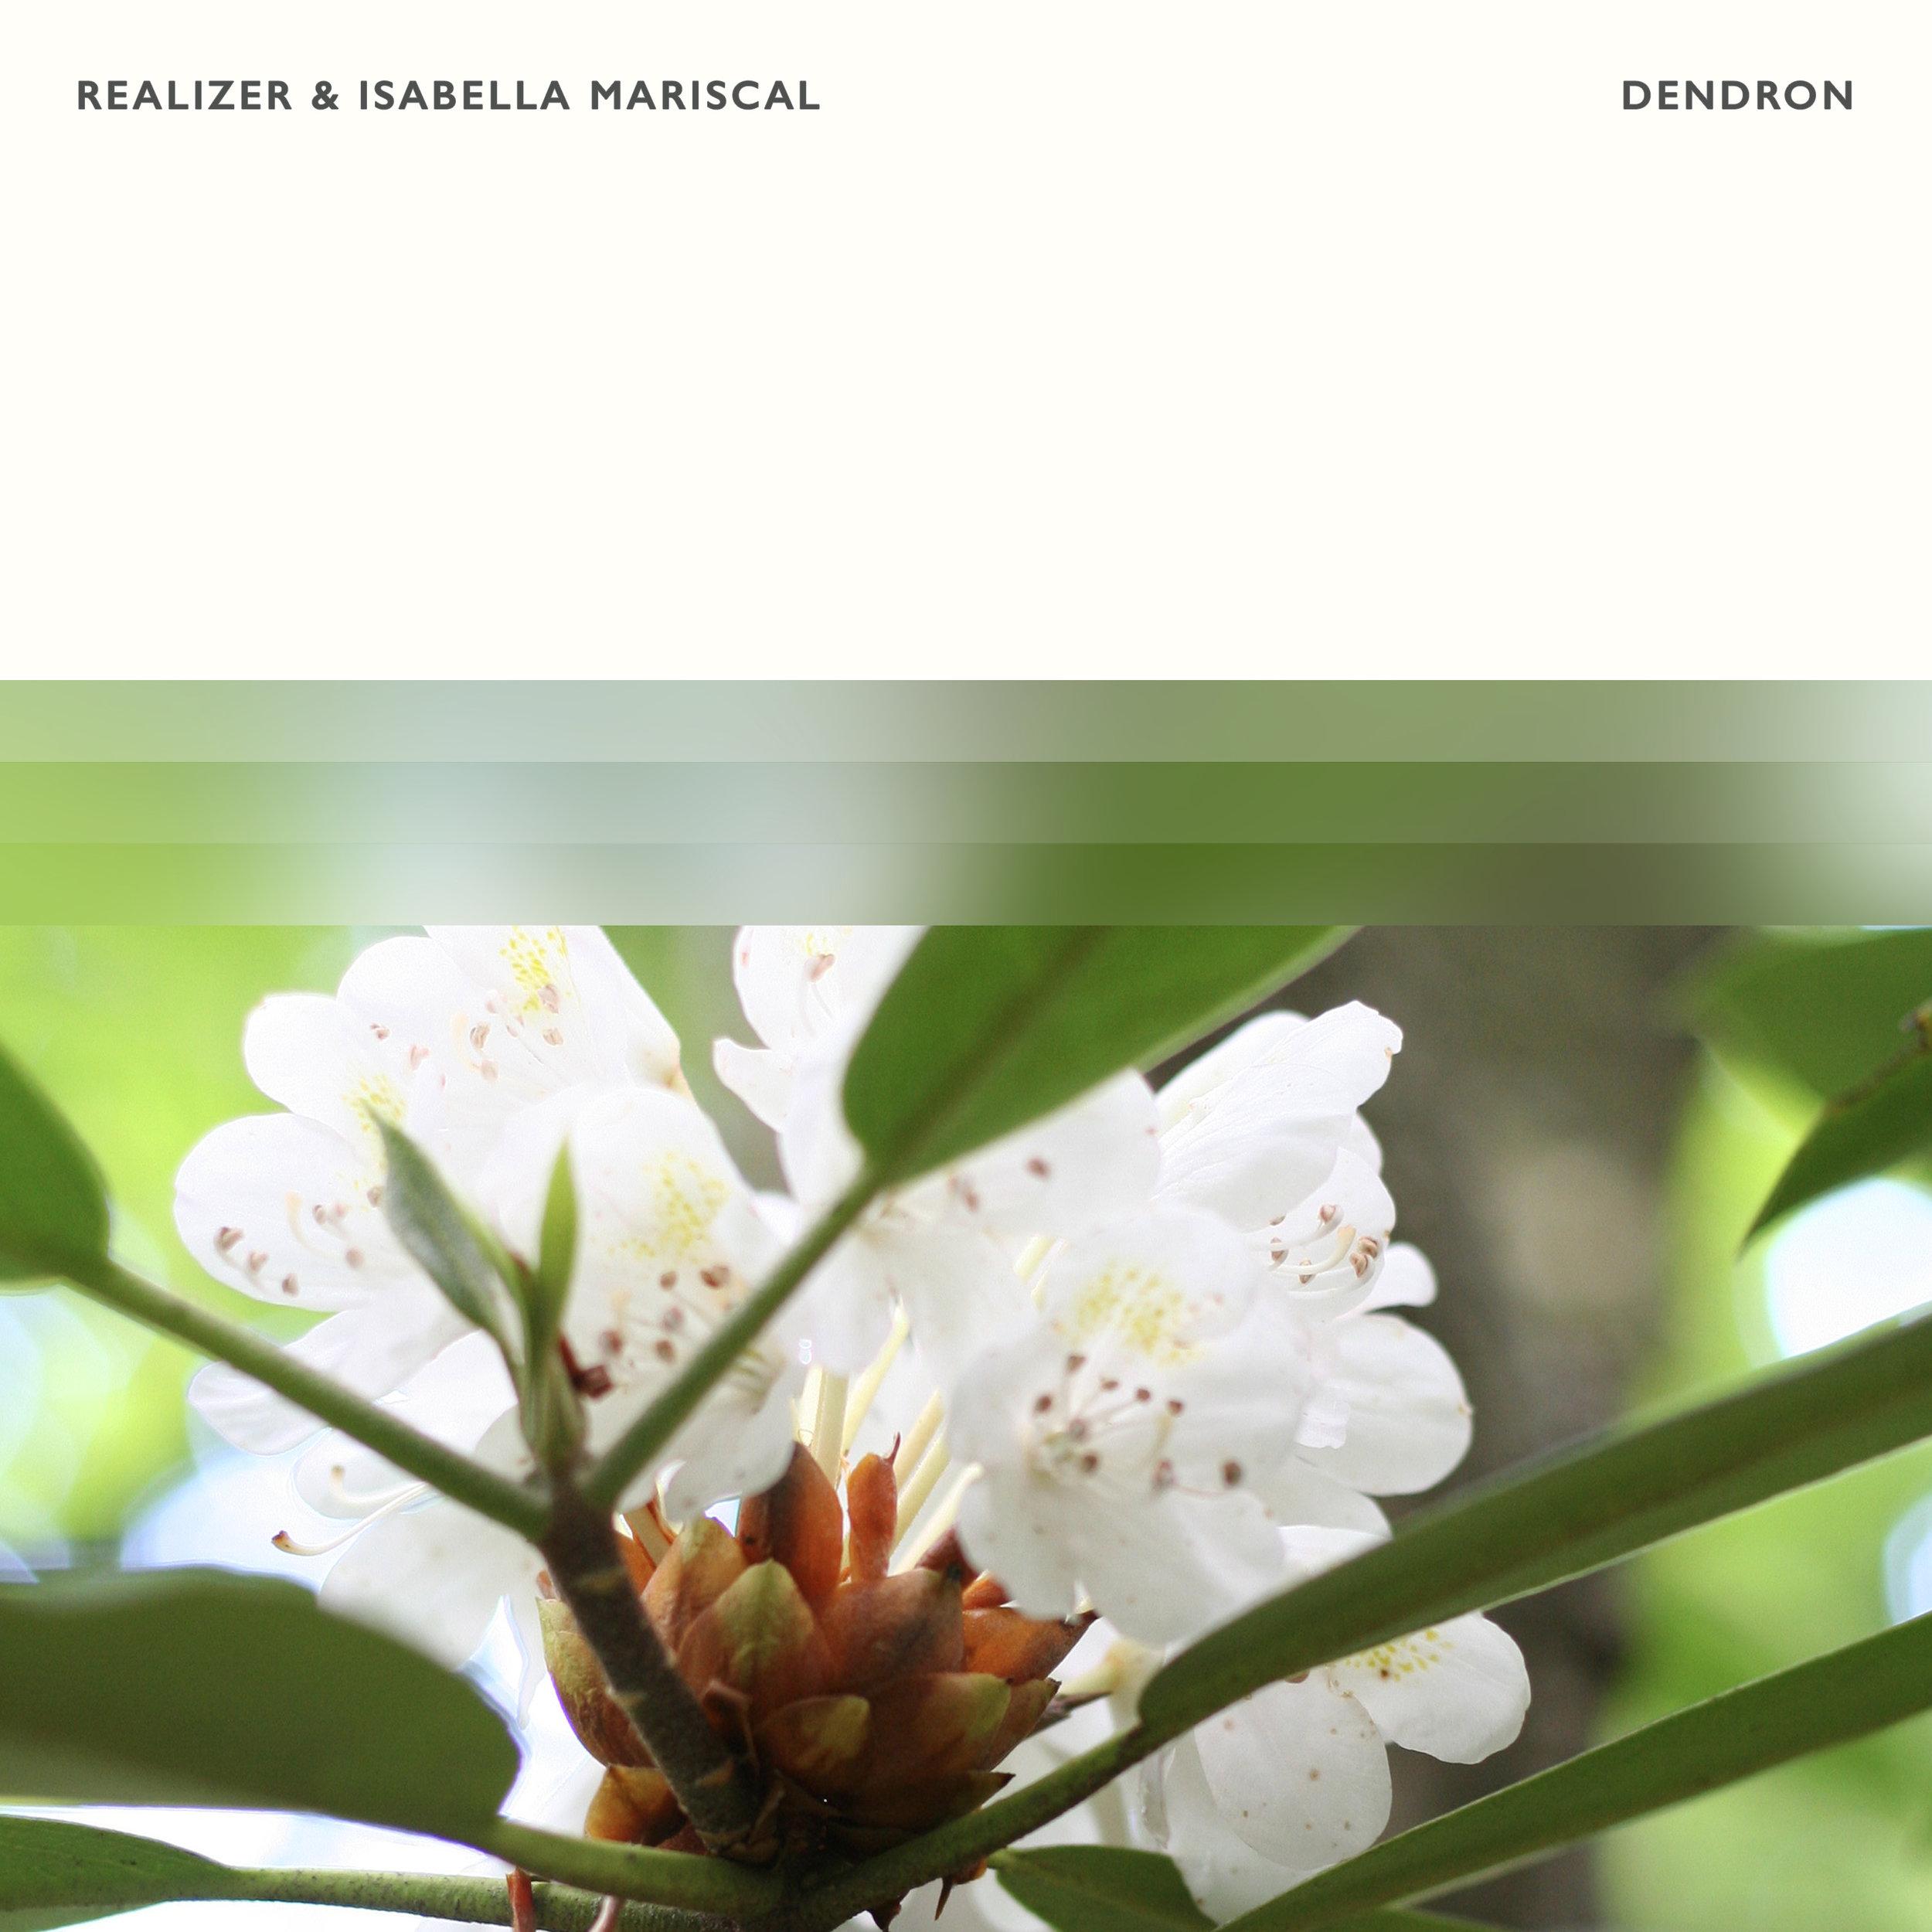 Realizer & Isabella Mariscal — Dendron